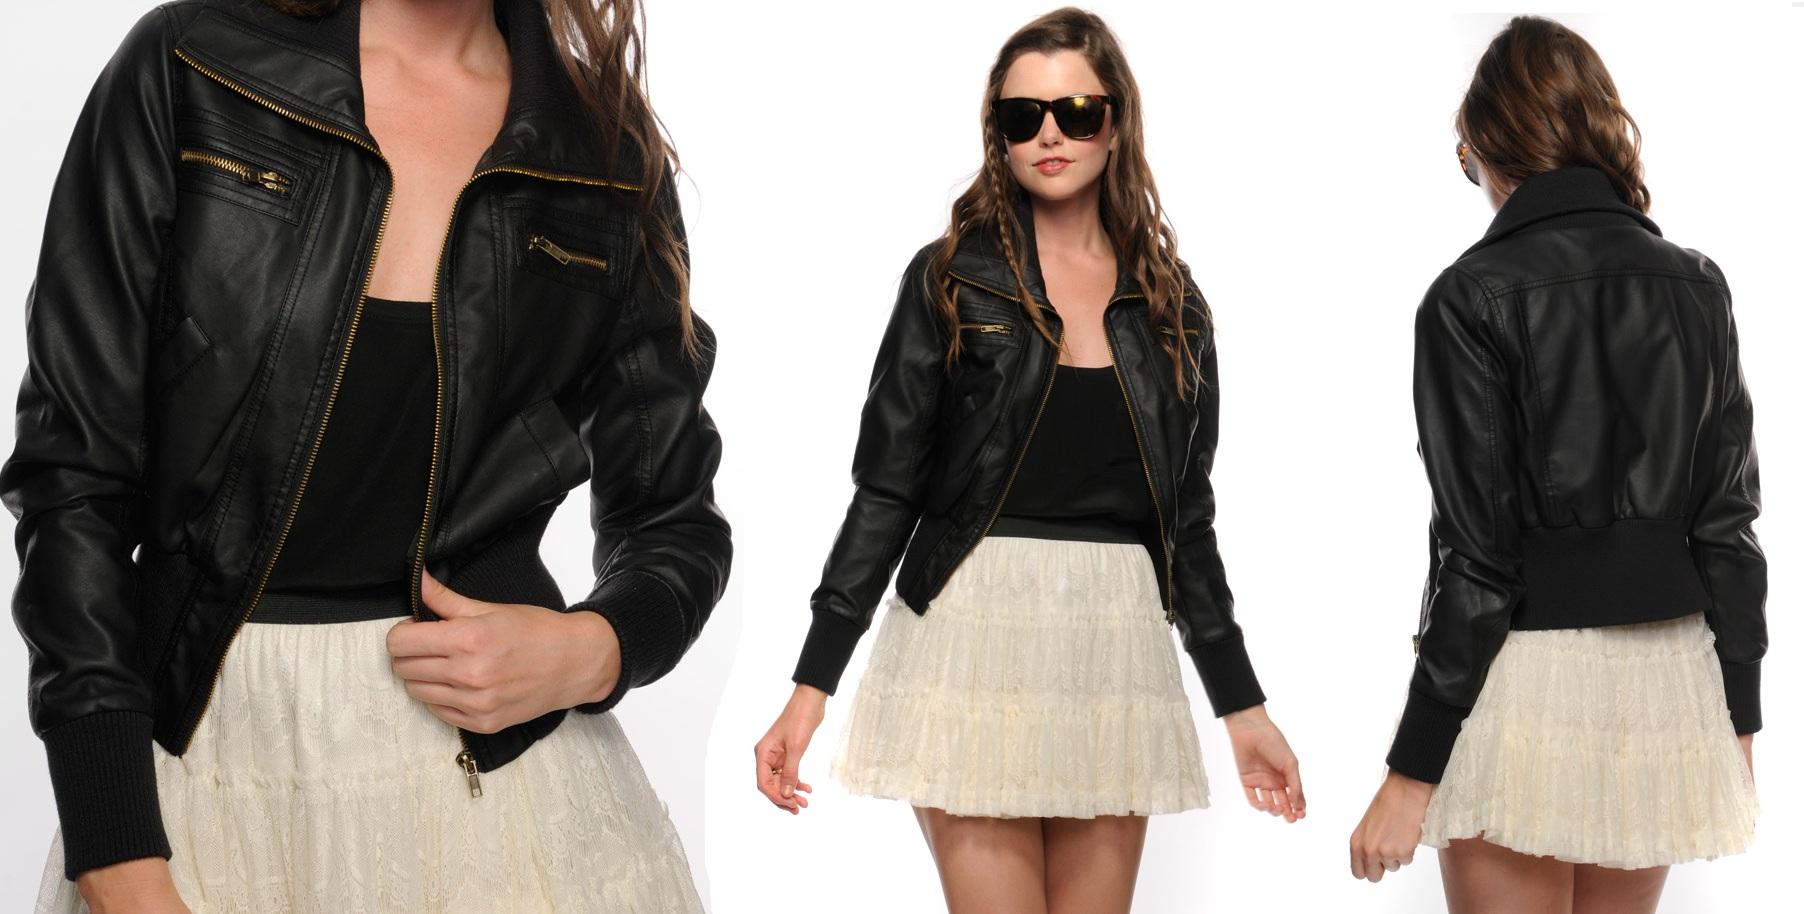 Black Leather Forever 21